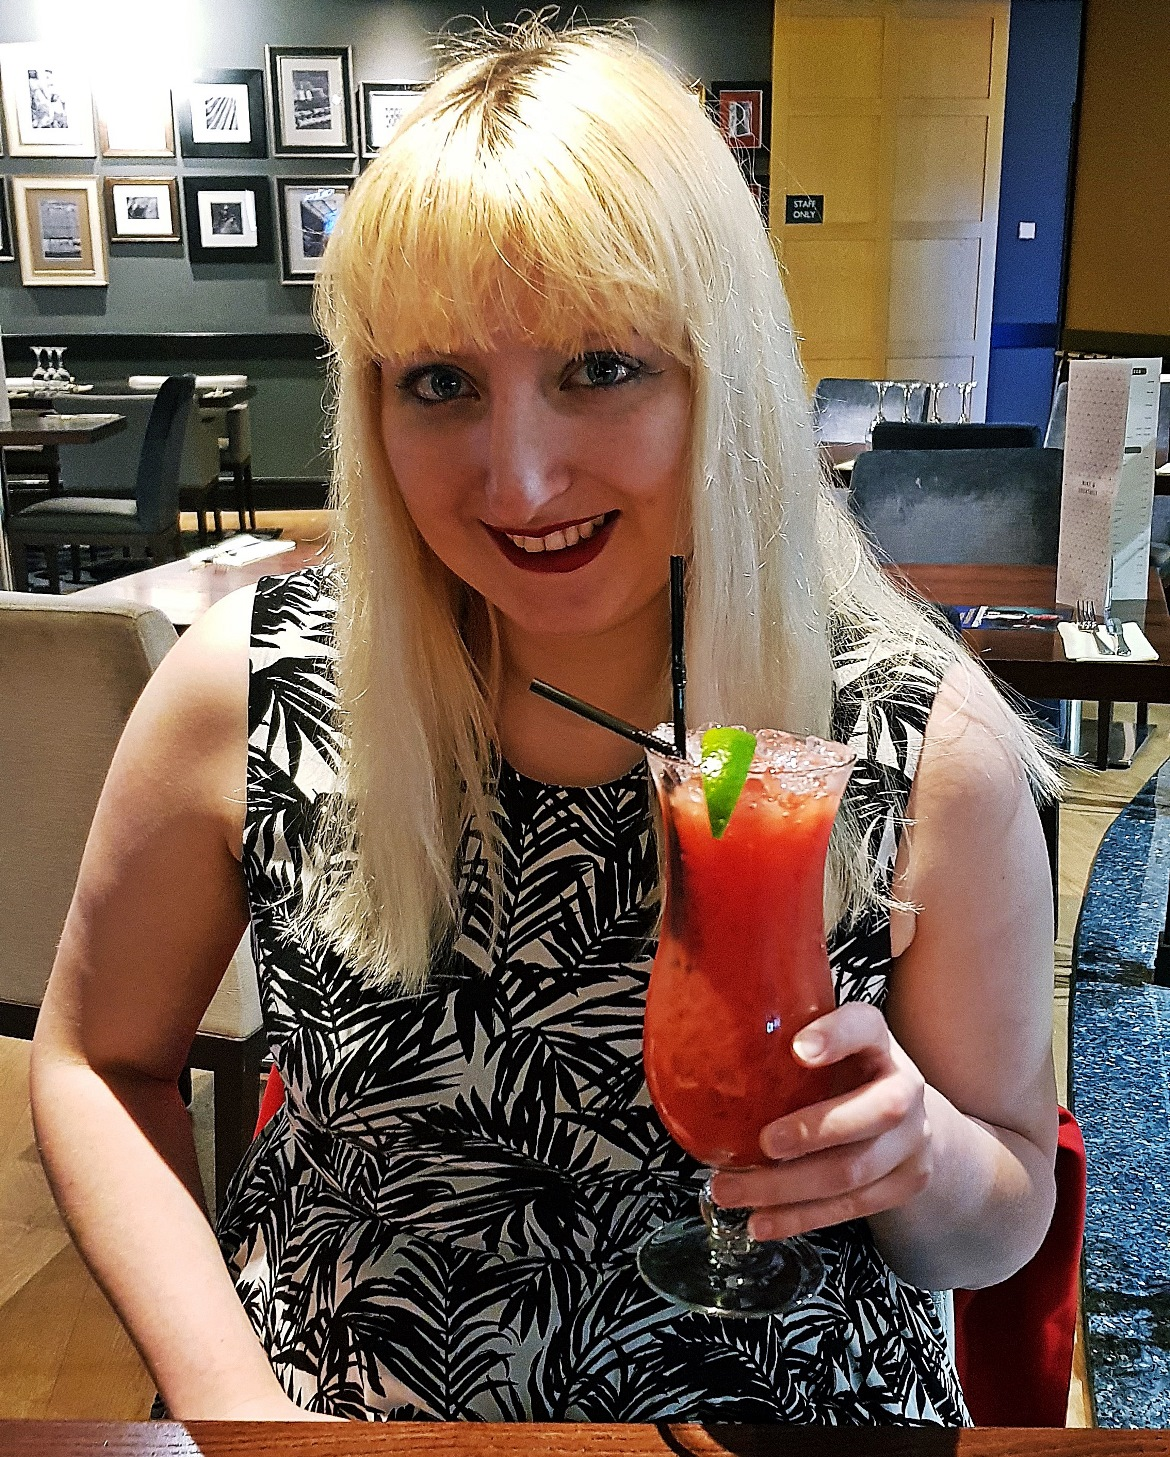 Strawberry daiquiri - Grosvenor Casino Leeds review by BeckyBecky Blogs